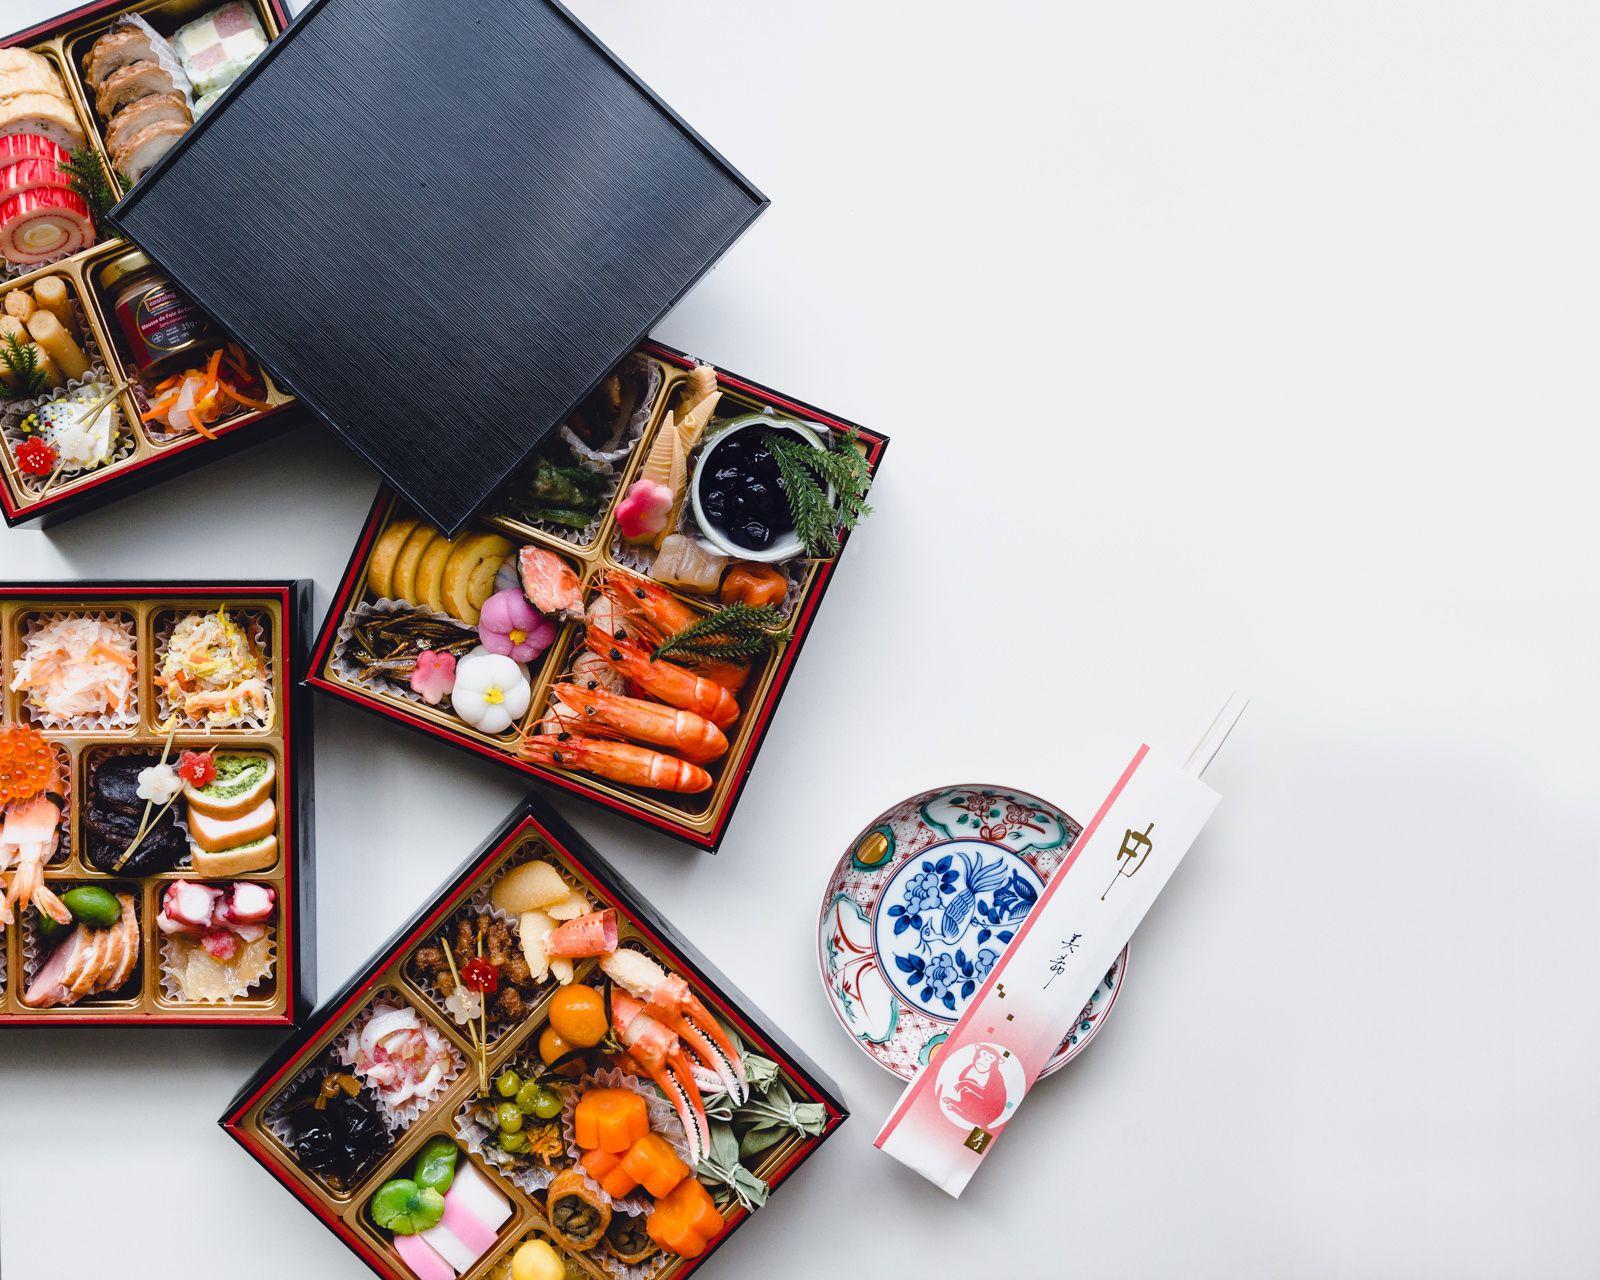 "osechi-ryōri - special dishes prepared for the new year.<br>ғᴏʟʟᴏᴡ ☞ <a rel=""nofollow"" href=""http://texturelikemouton.tumblr.com/"">ᴛᴜᴍʙʟʀ</a>  | <a rel=""nofollow"" href=""https://instagram.com/texturelikemouton/"">ɪɴsᴛᴀɢʀᴀᴍ</a>"